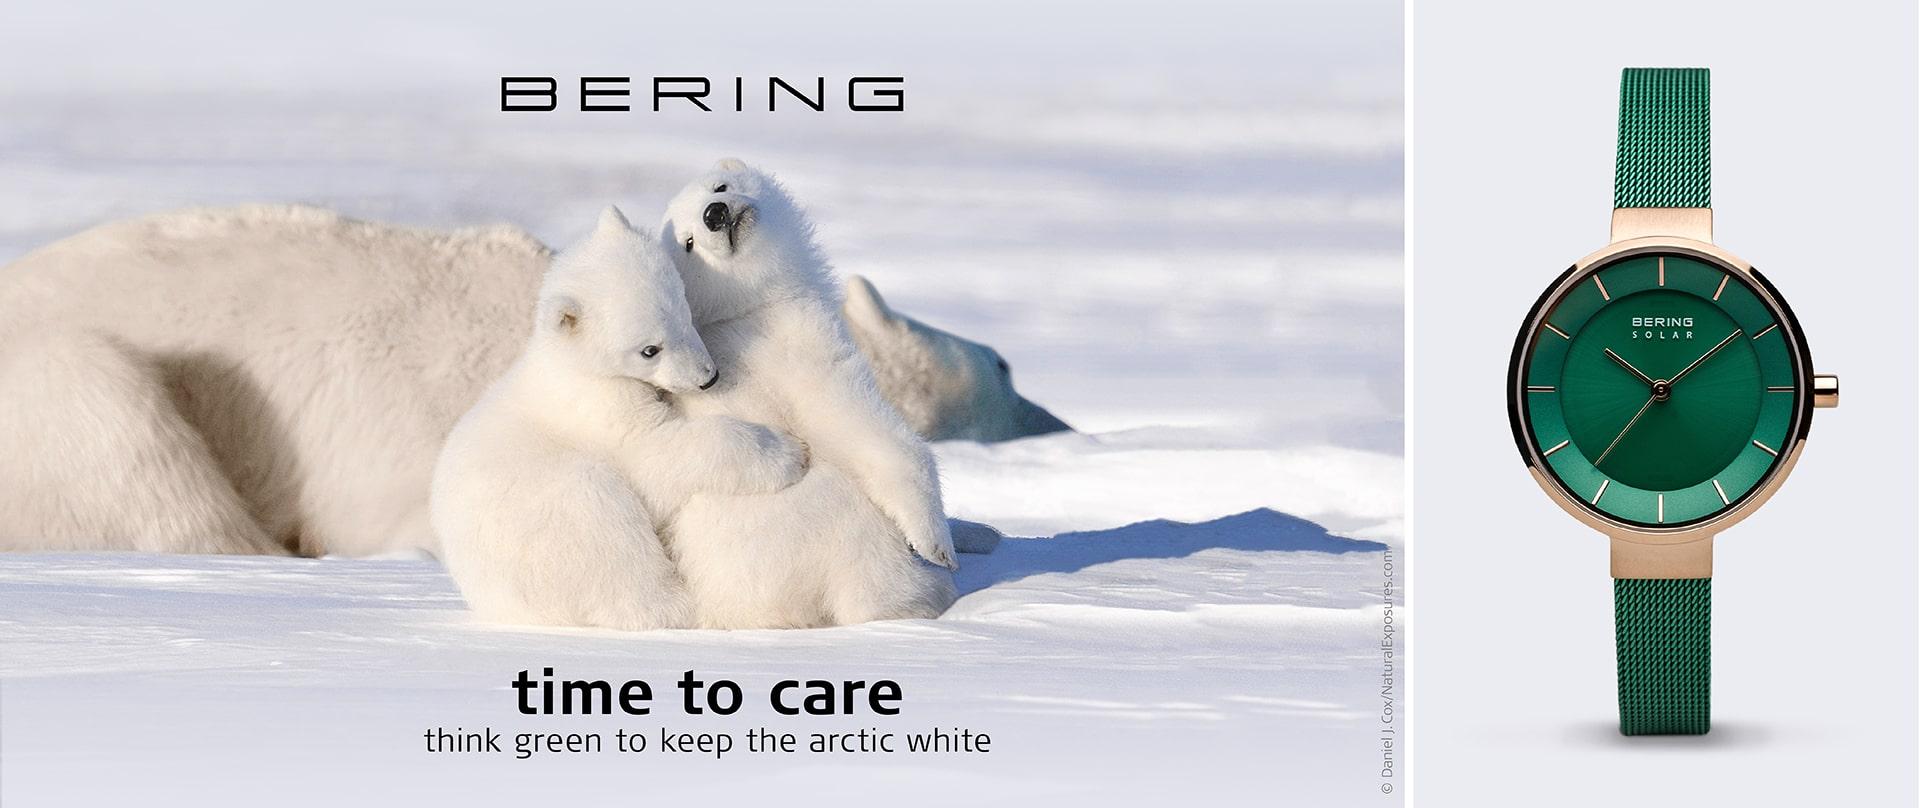 2019-12-14_BERING_Webbanner_Charity2019_Solar_1900x800px_v2_3-min